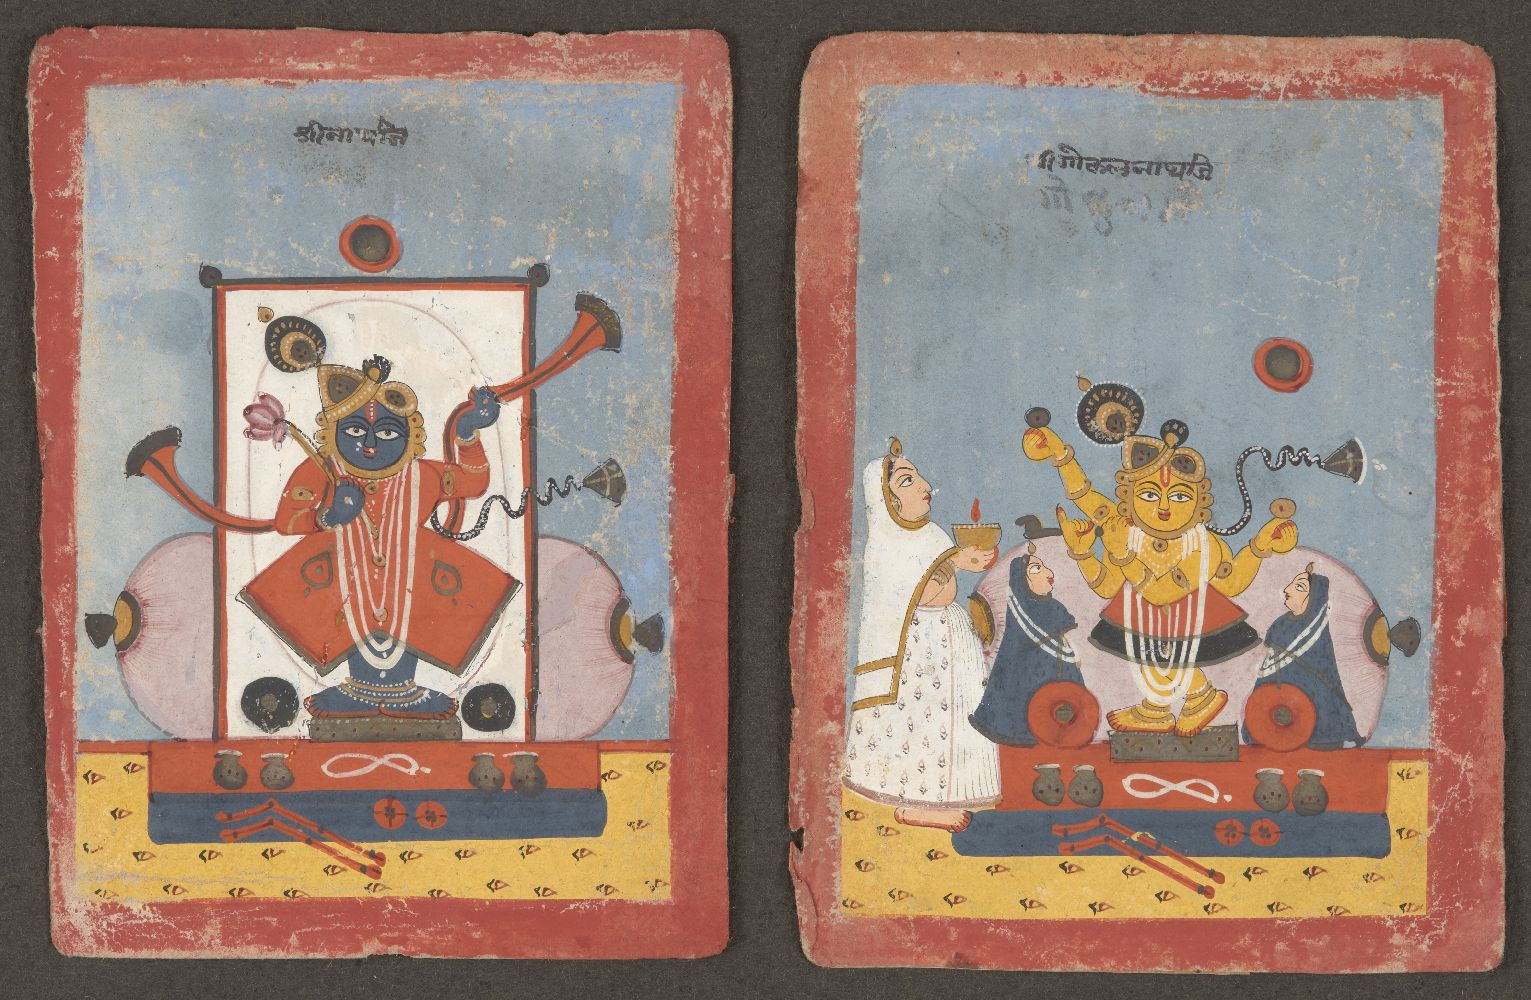 Srinathji in the guise of Shiva and Srinathji, Central India, circa 1700, opaque pigment on paper,